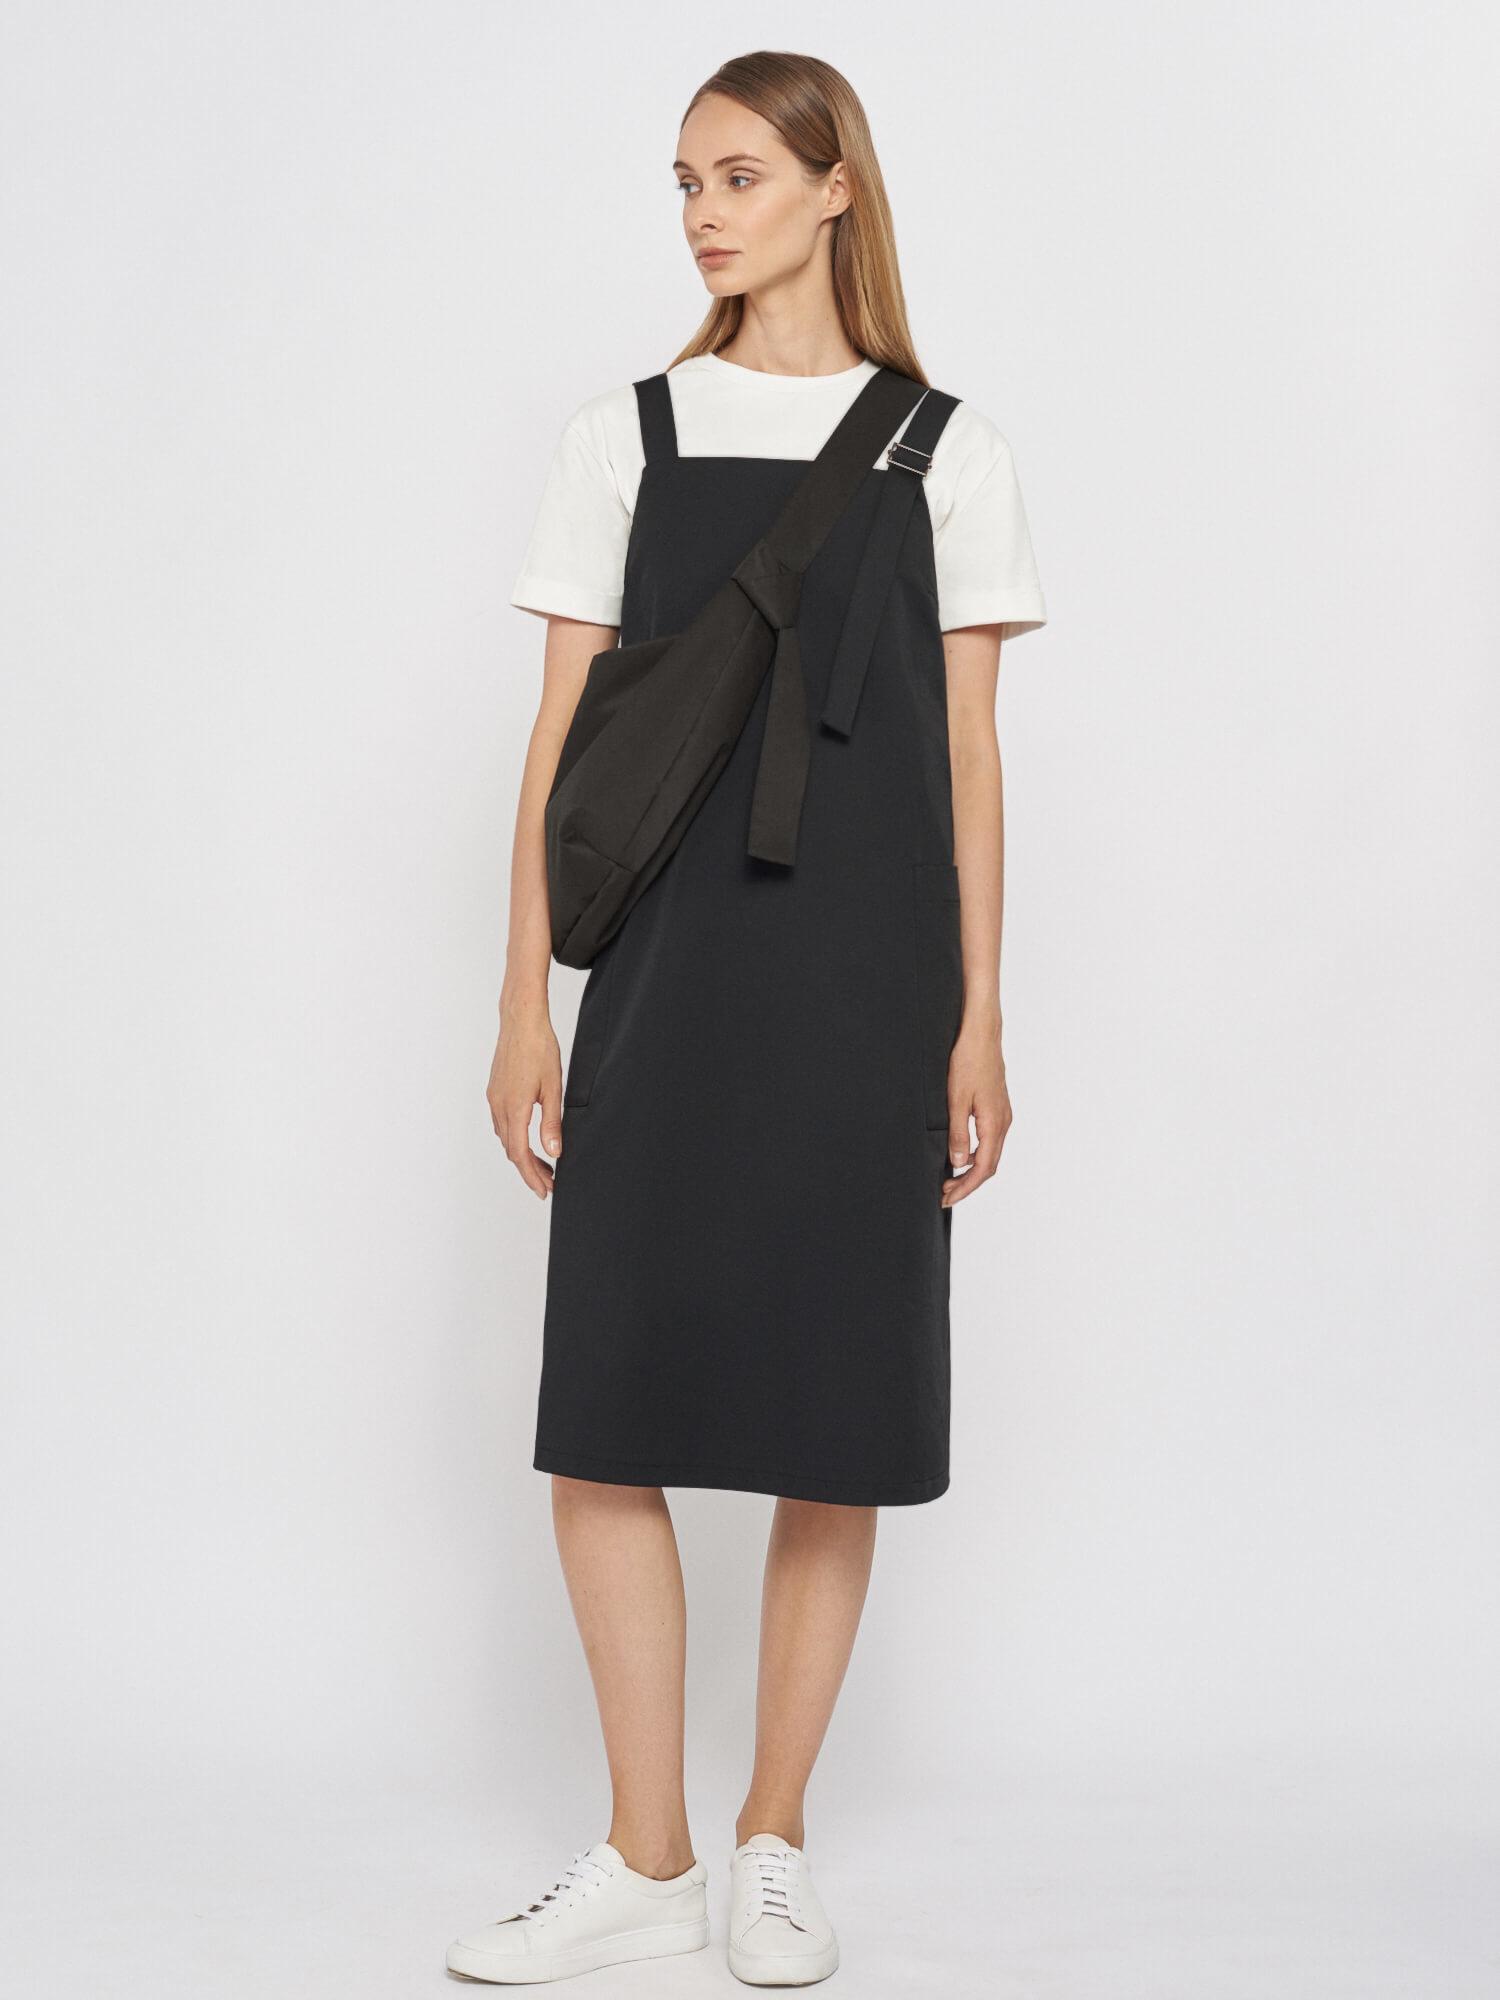 Платье-сарафан Jennifer на бретелях фото